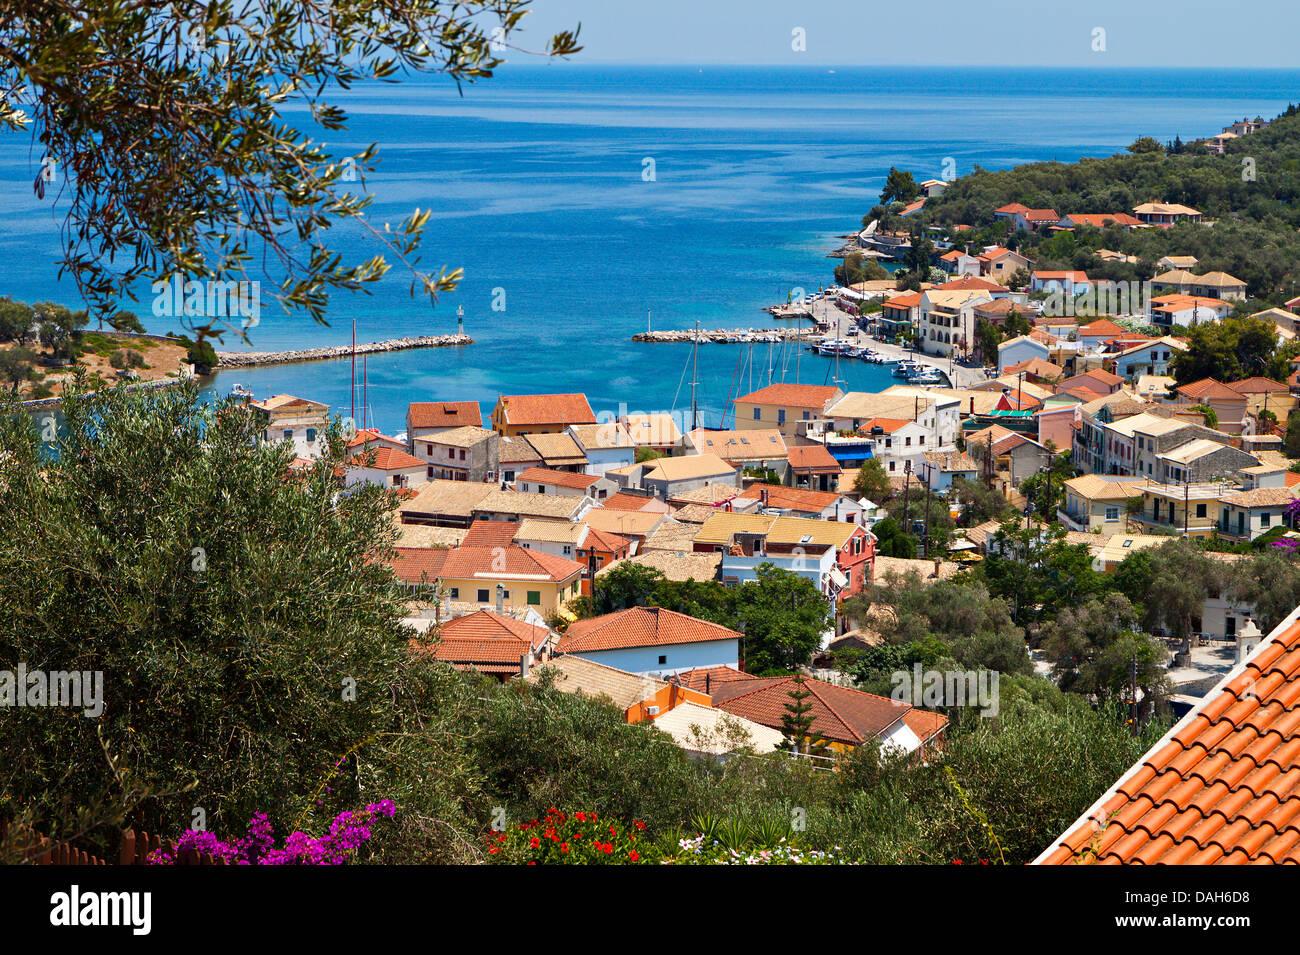 Gaios port at Paxos island in Greece. Ionian sea - Stock Image